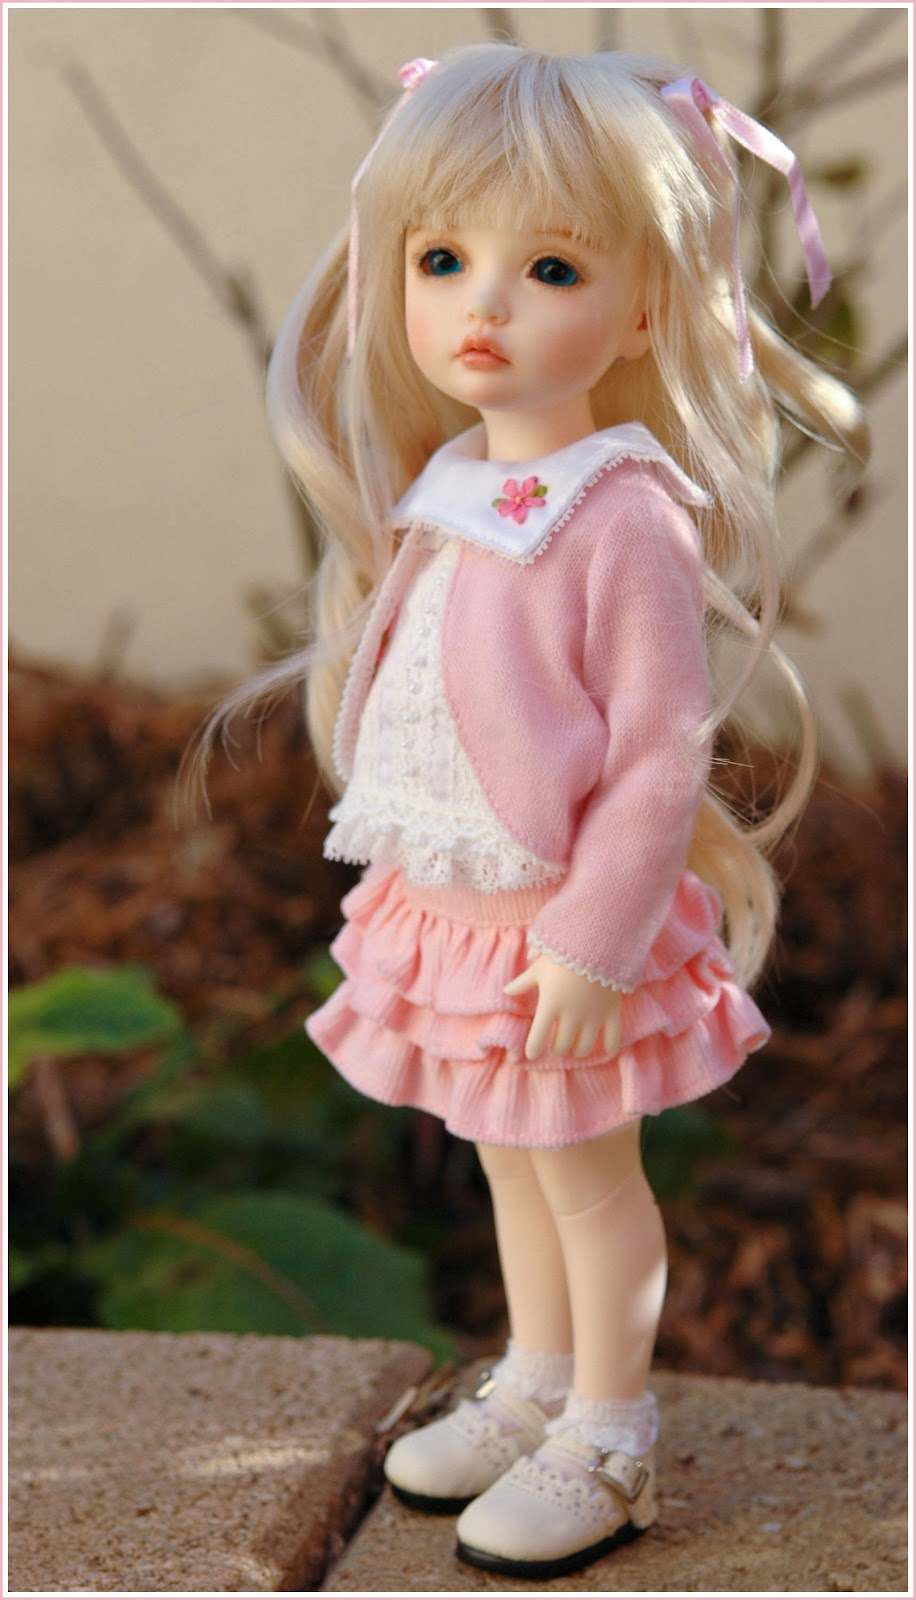 Rose: Cut Dolls